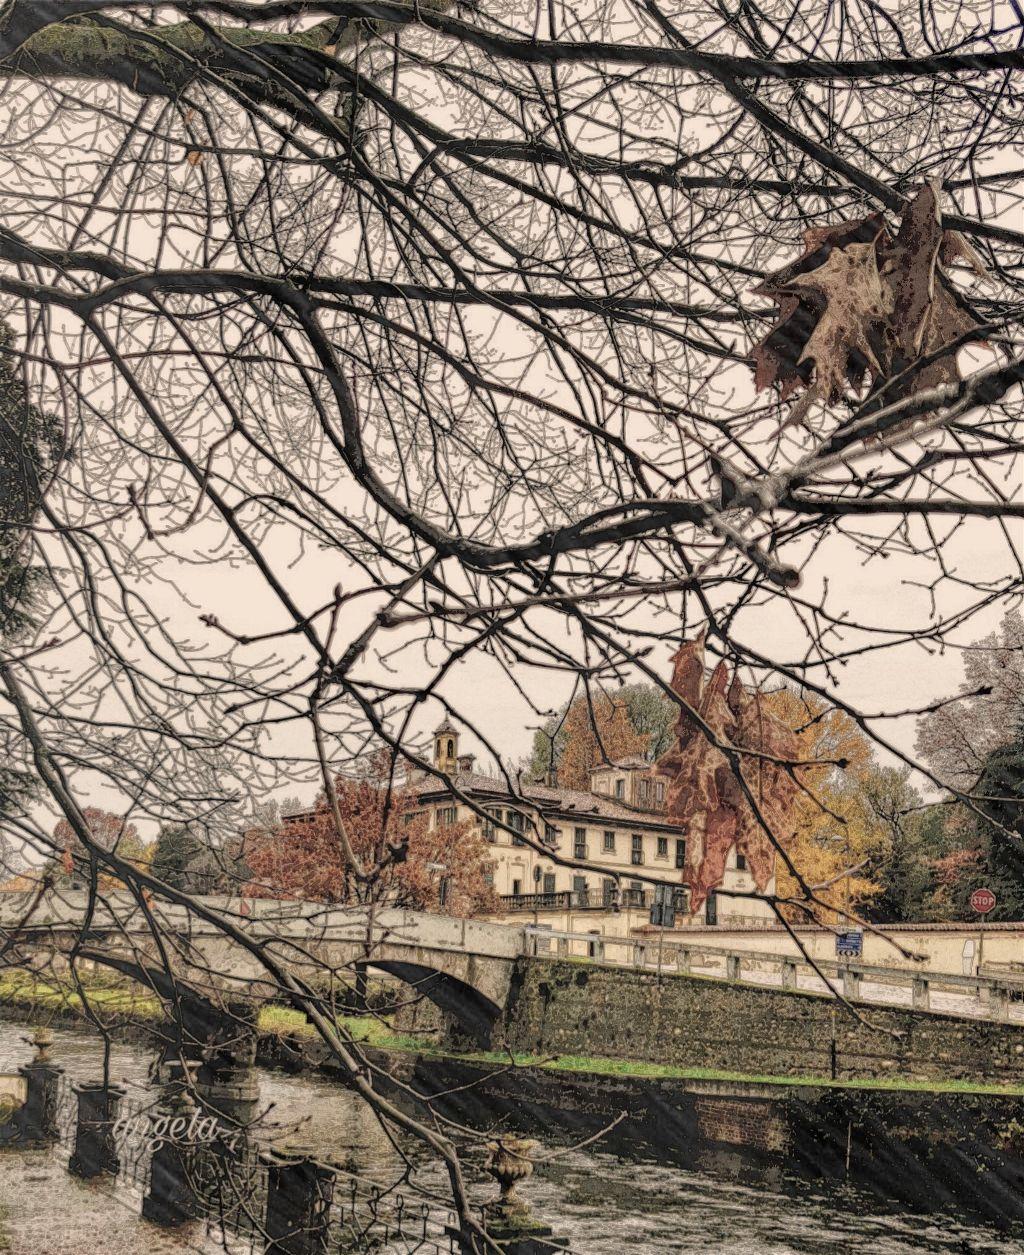 #freetoedit #landscape #tree #river #myphoto #lombardia #italia